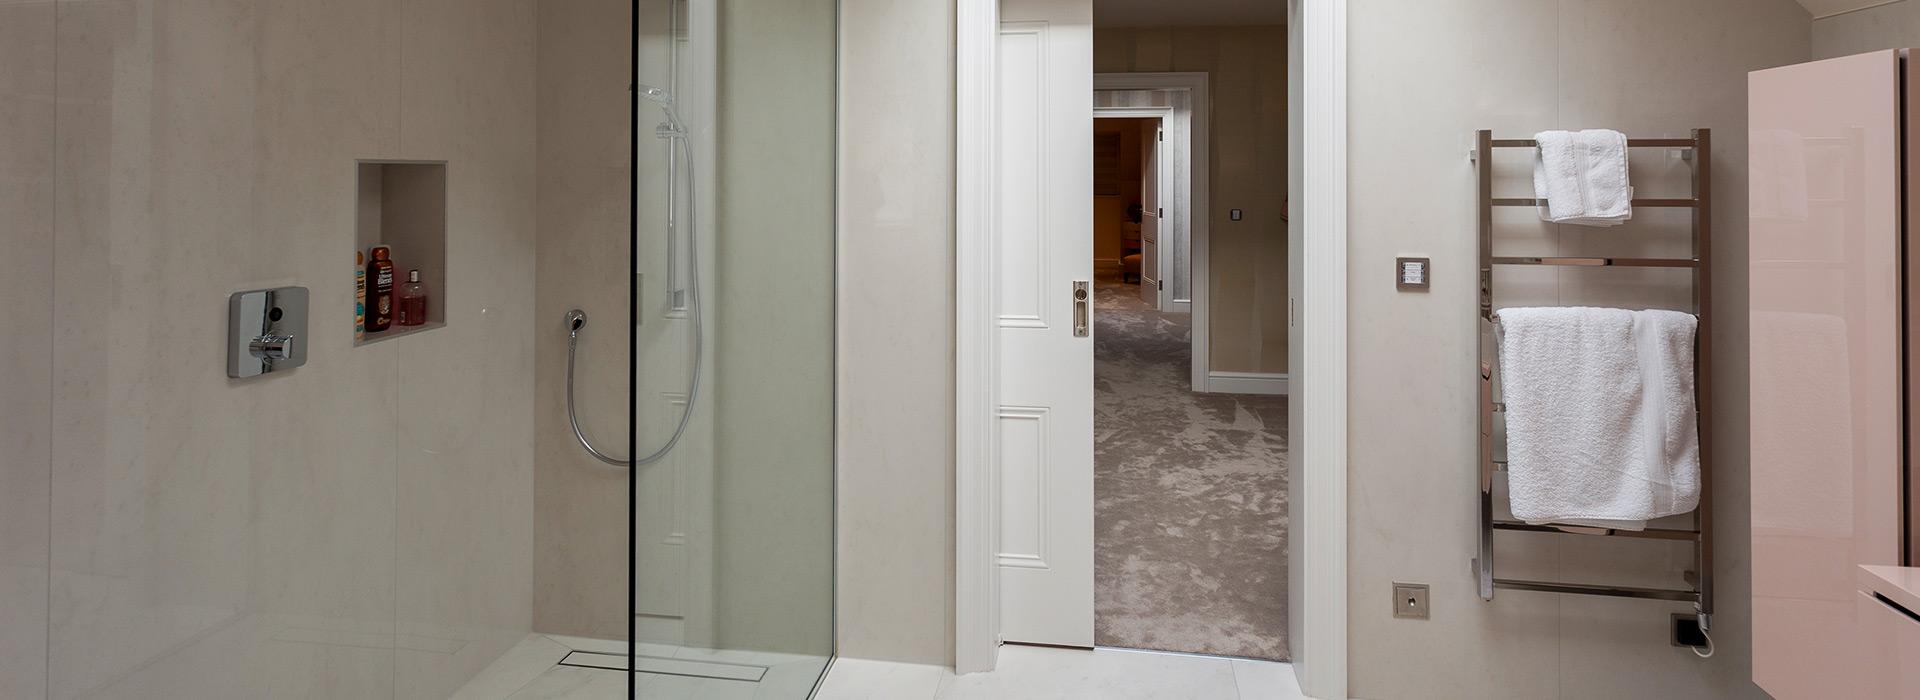 Sliding pocket door to shower